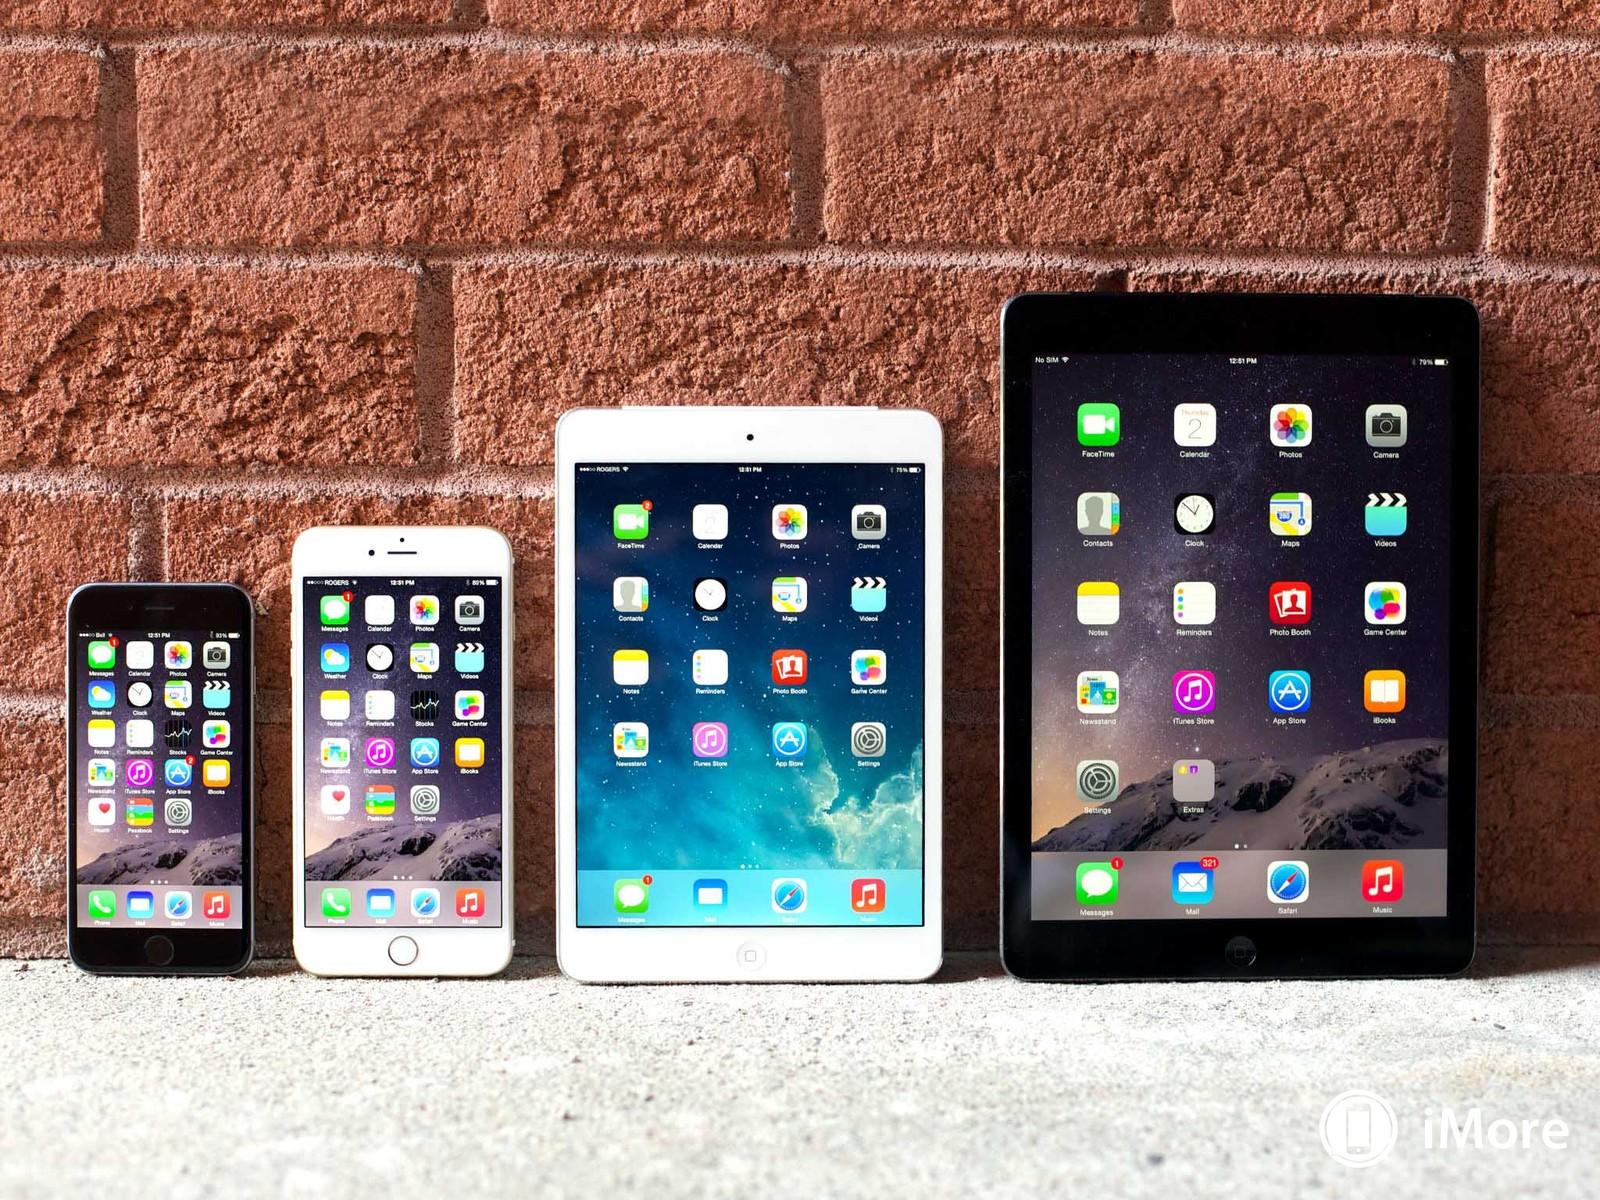 gagner un iphone gratuitement 2014